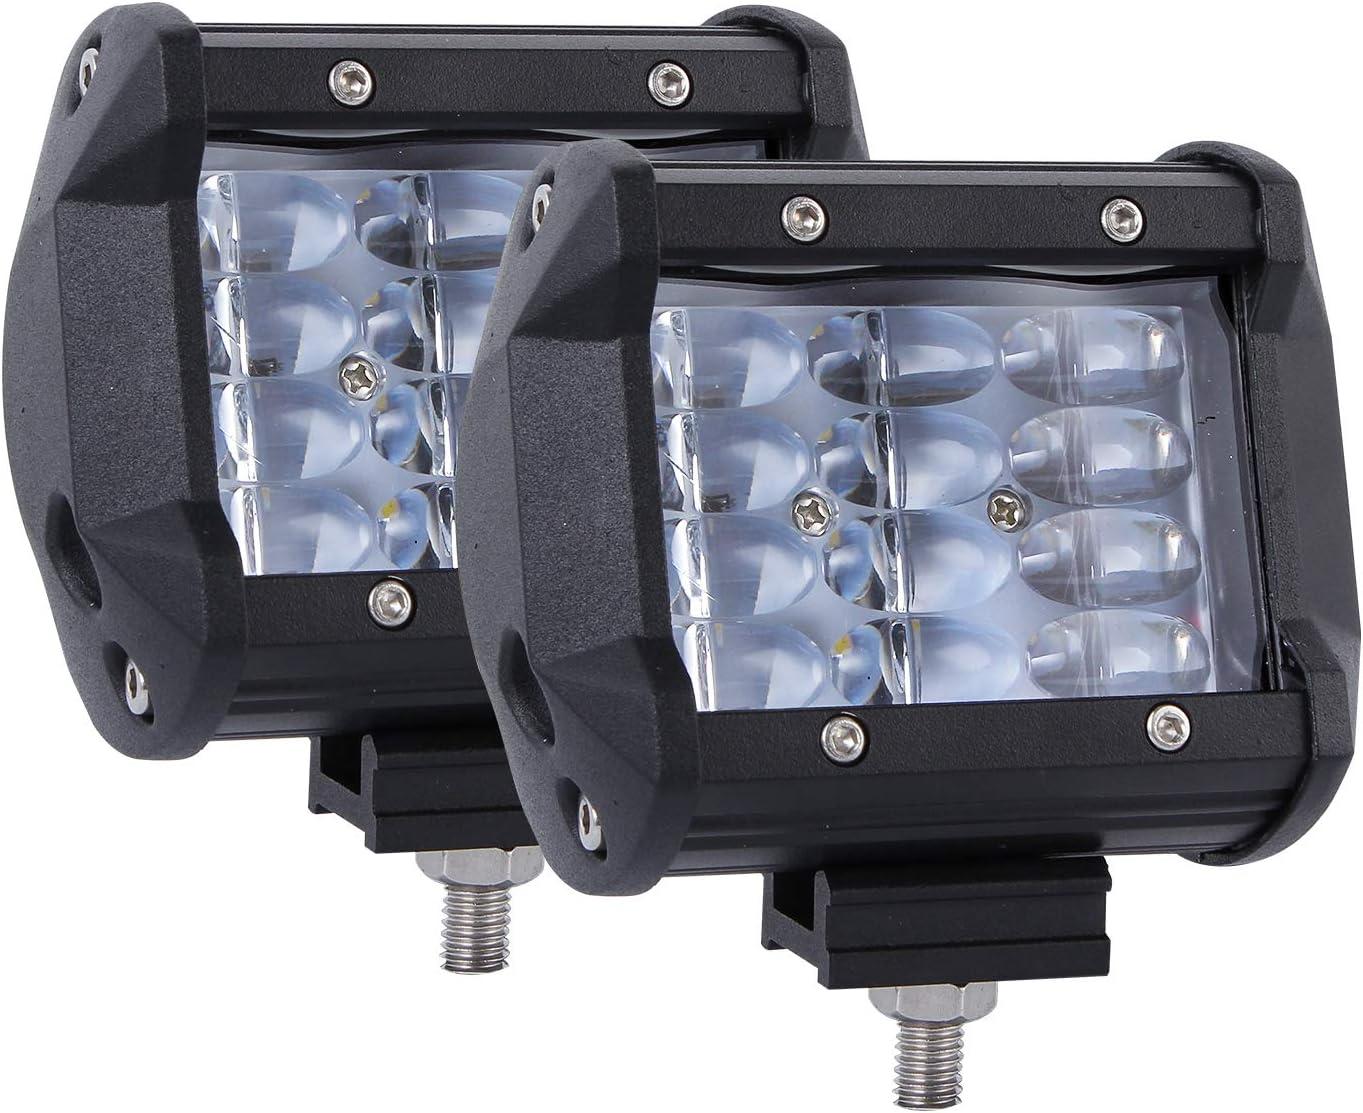 GZCRDZ 4 Inch 108W 8D Lens Car Work Max 46% OFF Popular popular LED Lu Light Bar 10800